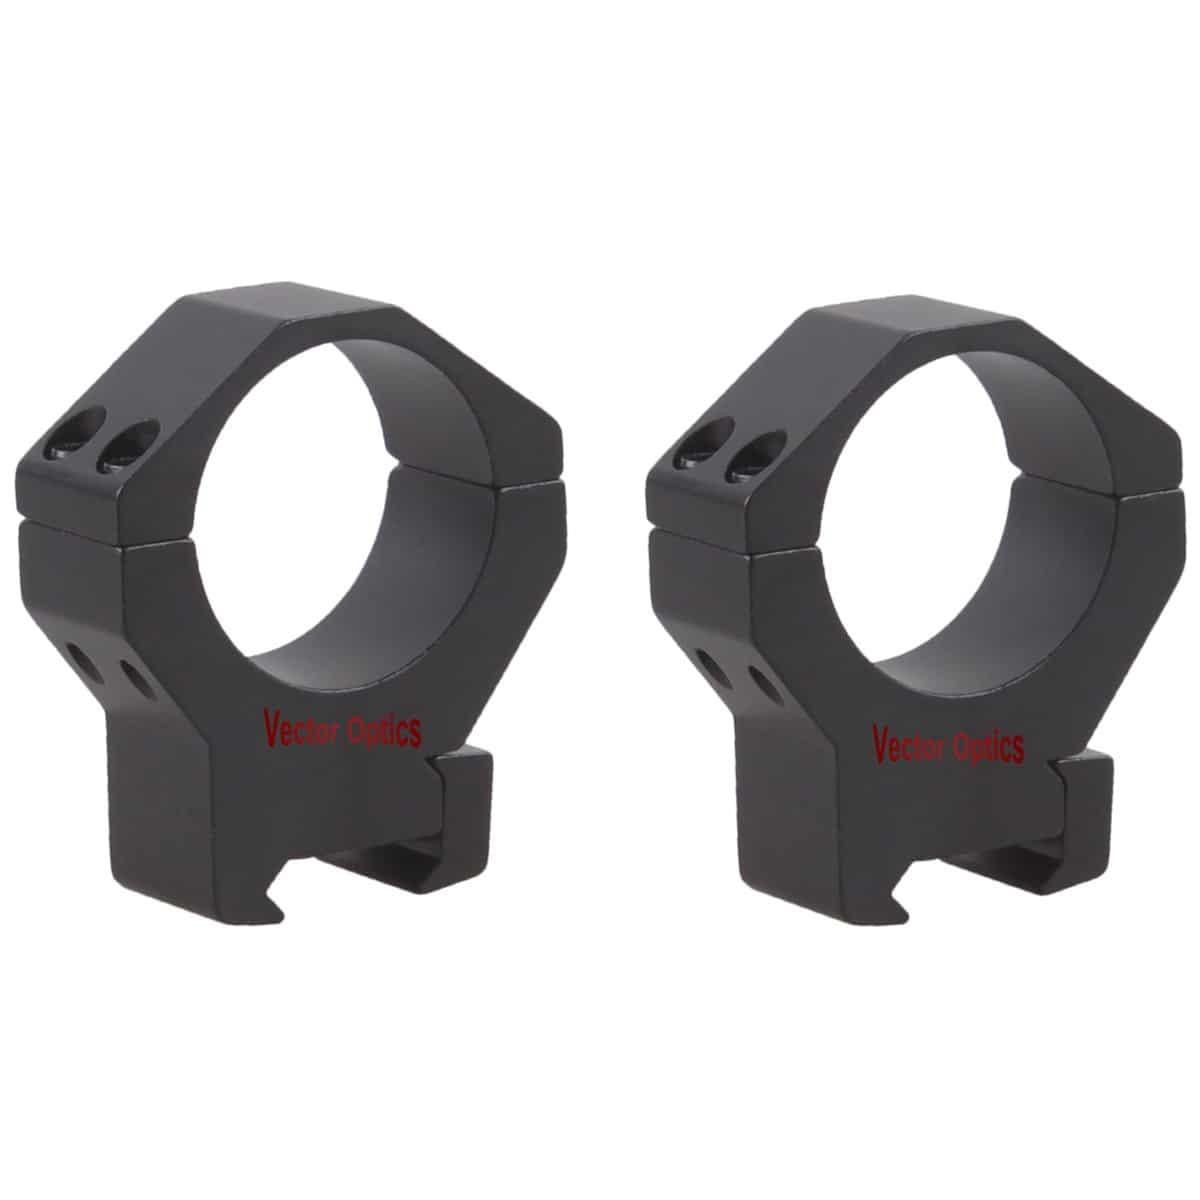 34mm Tactical Medium Picatinny Mount Rings